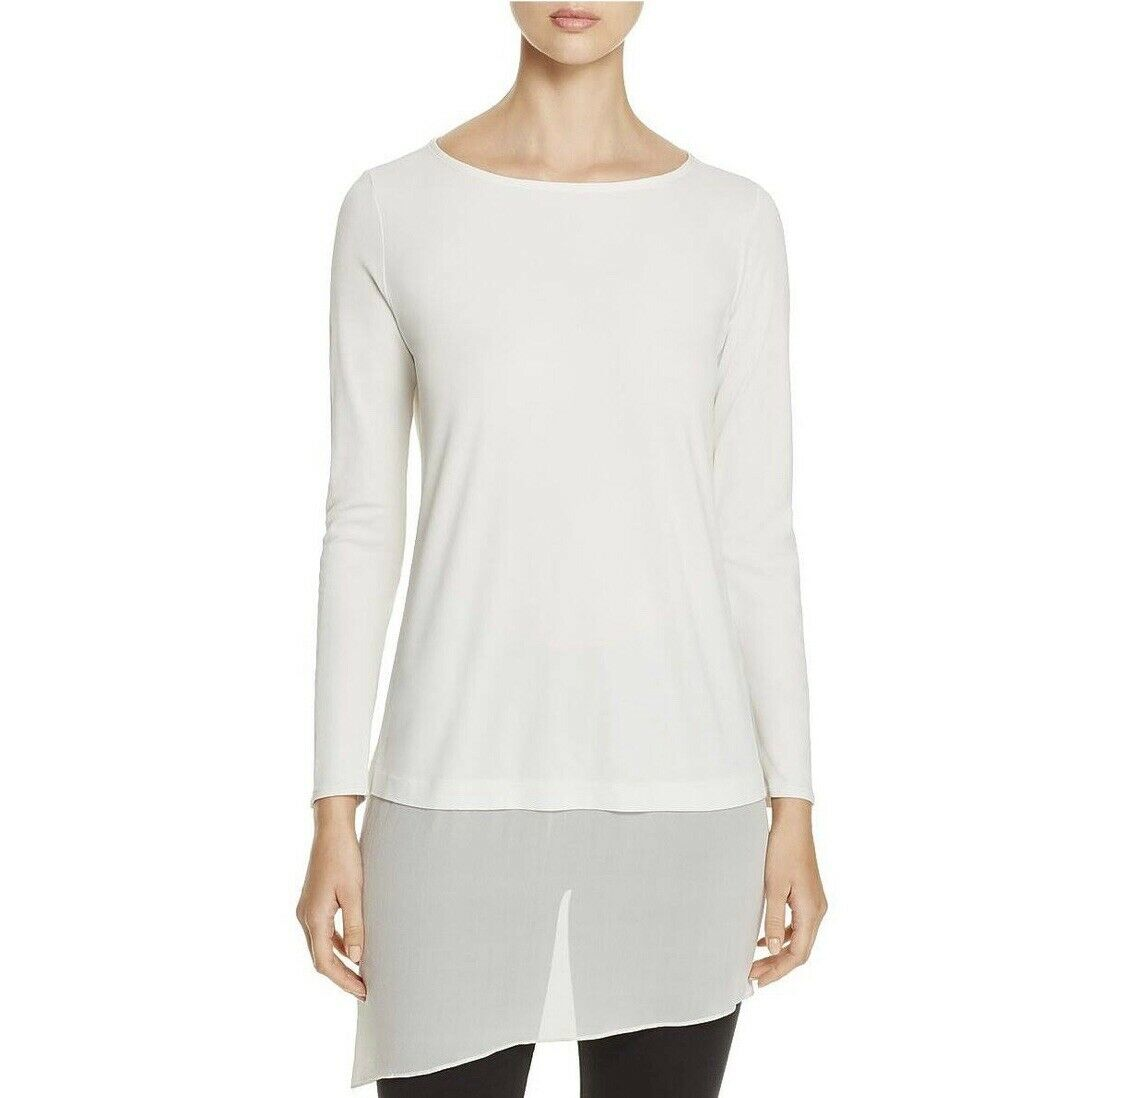 NEW Eileen Fisher Bateau Neck Layerot Tunic Top Shirt Asymmetric Hem Sz PM